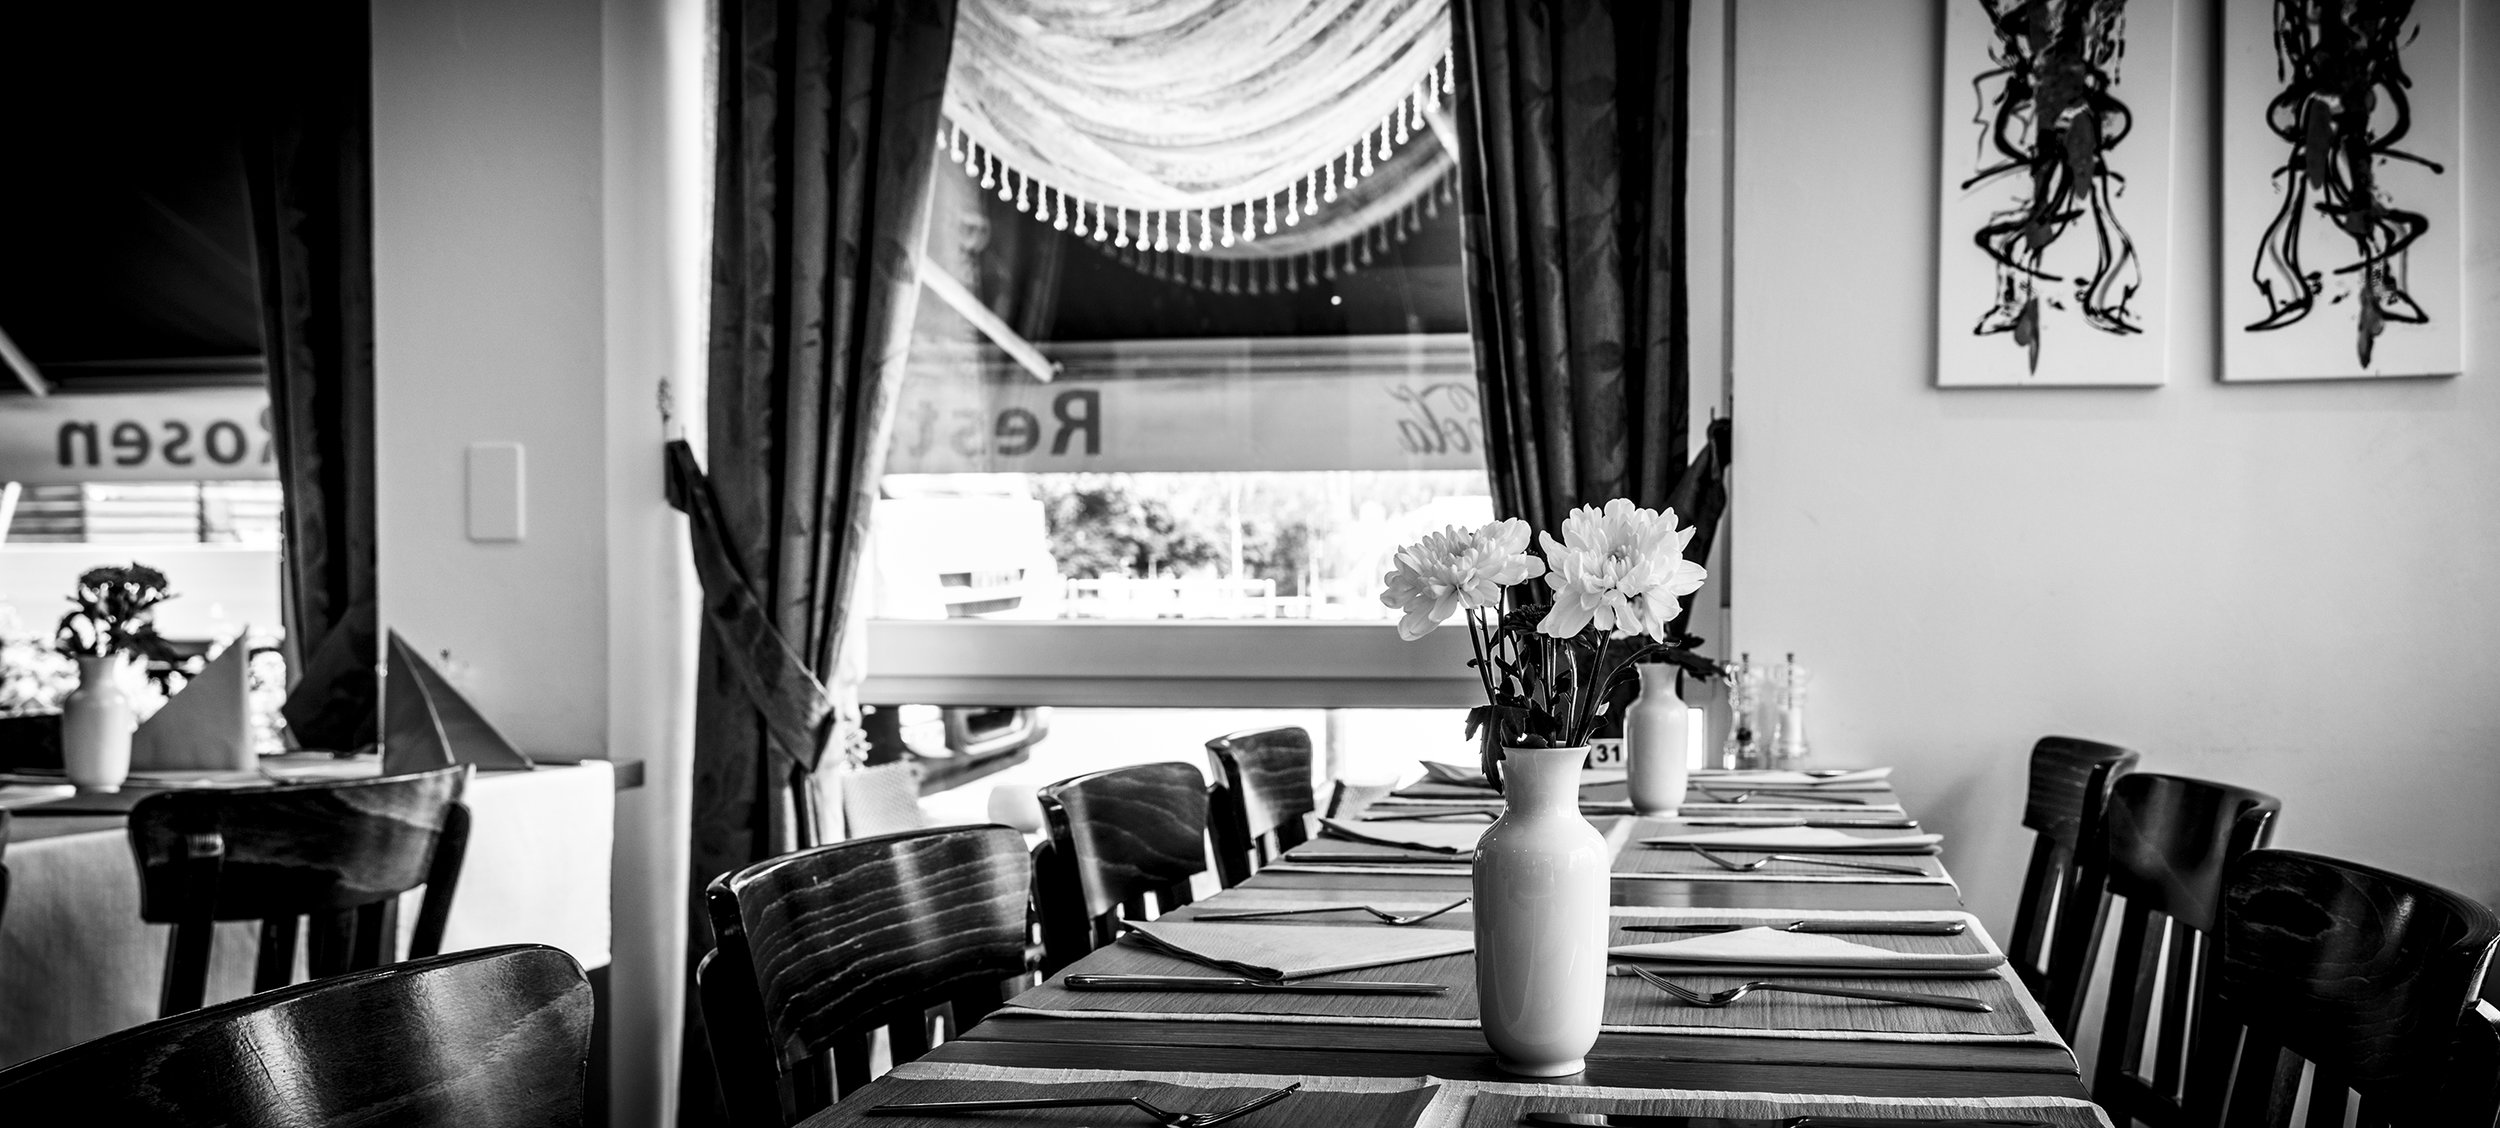 RestaurantB&W-7354_web.jpg